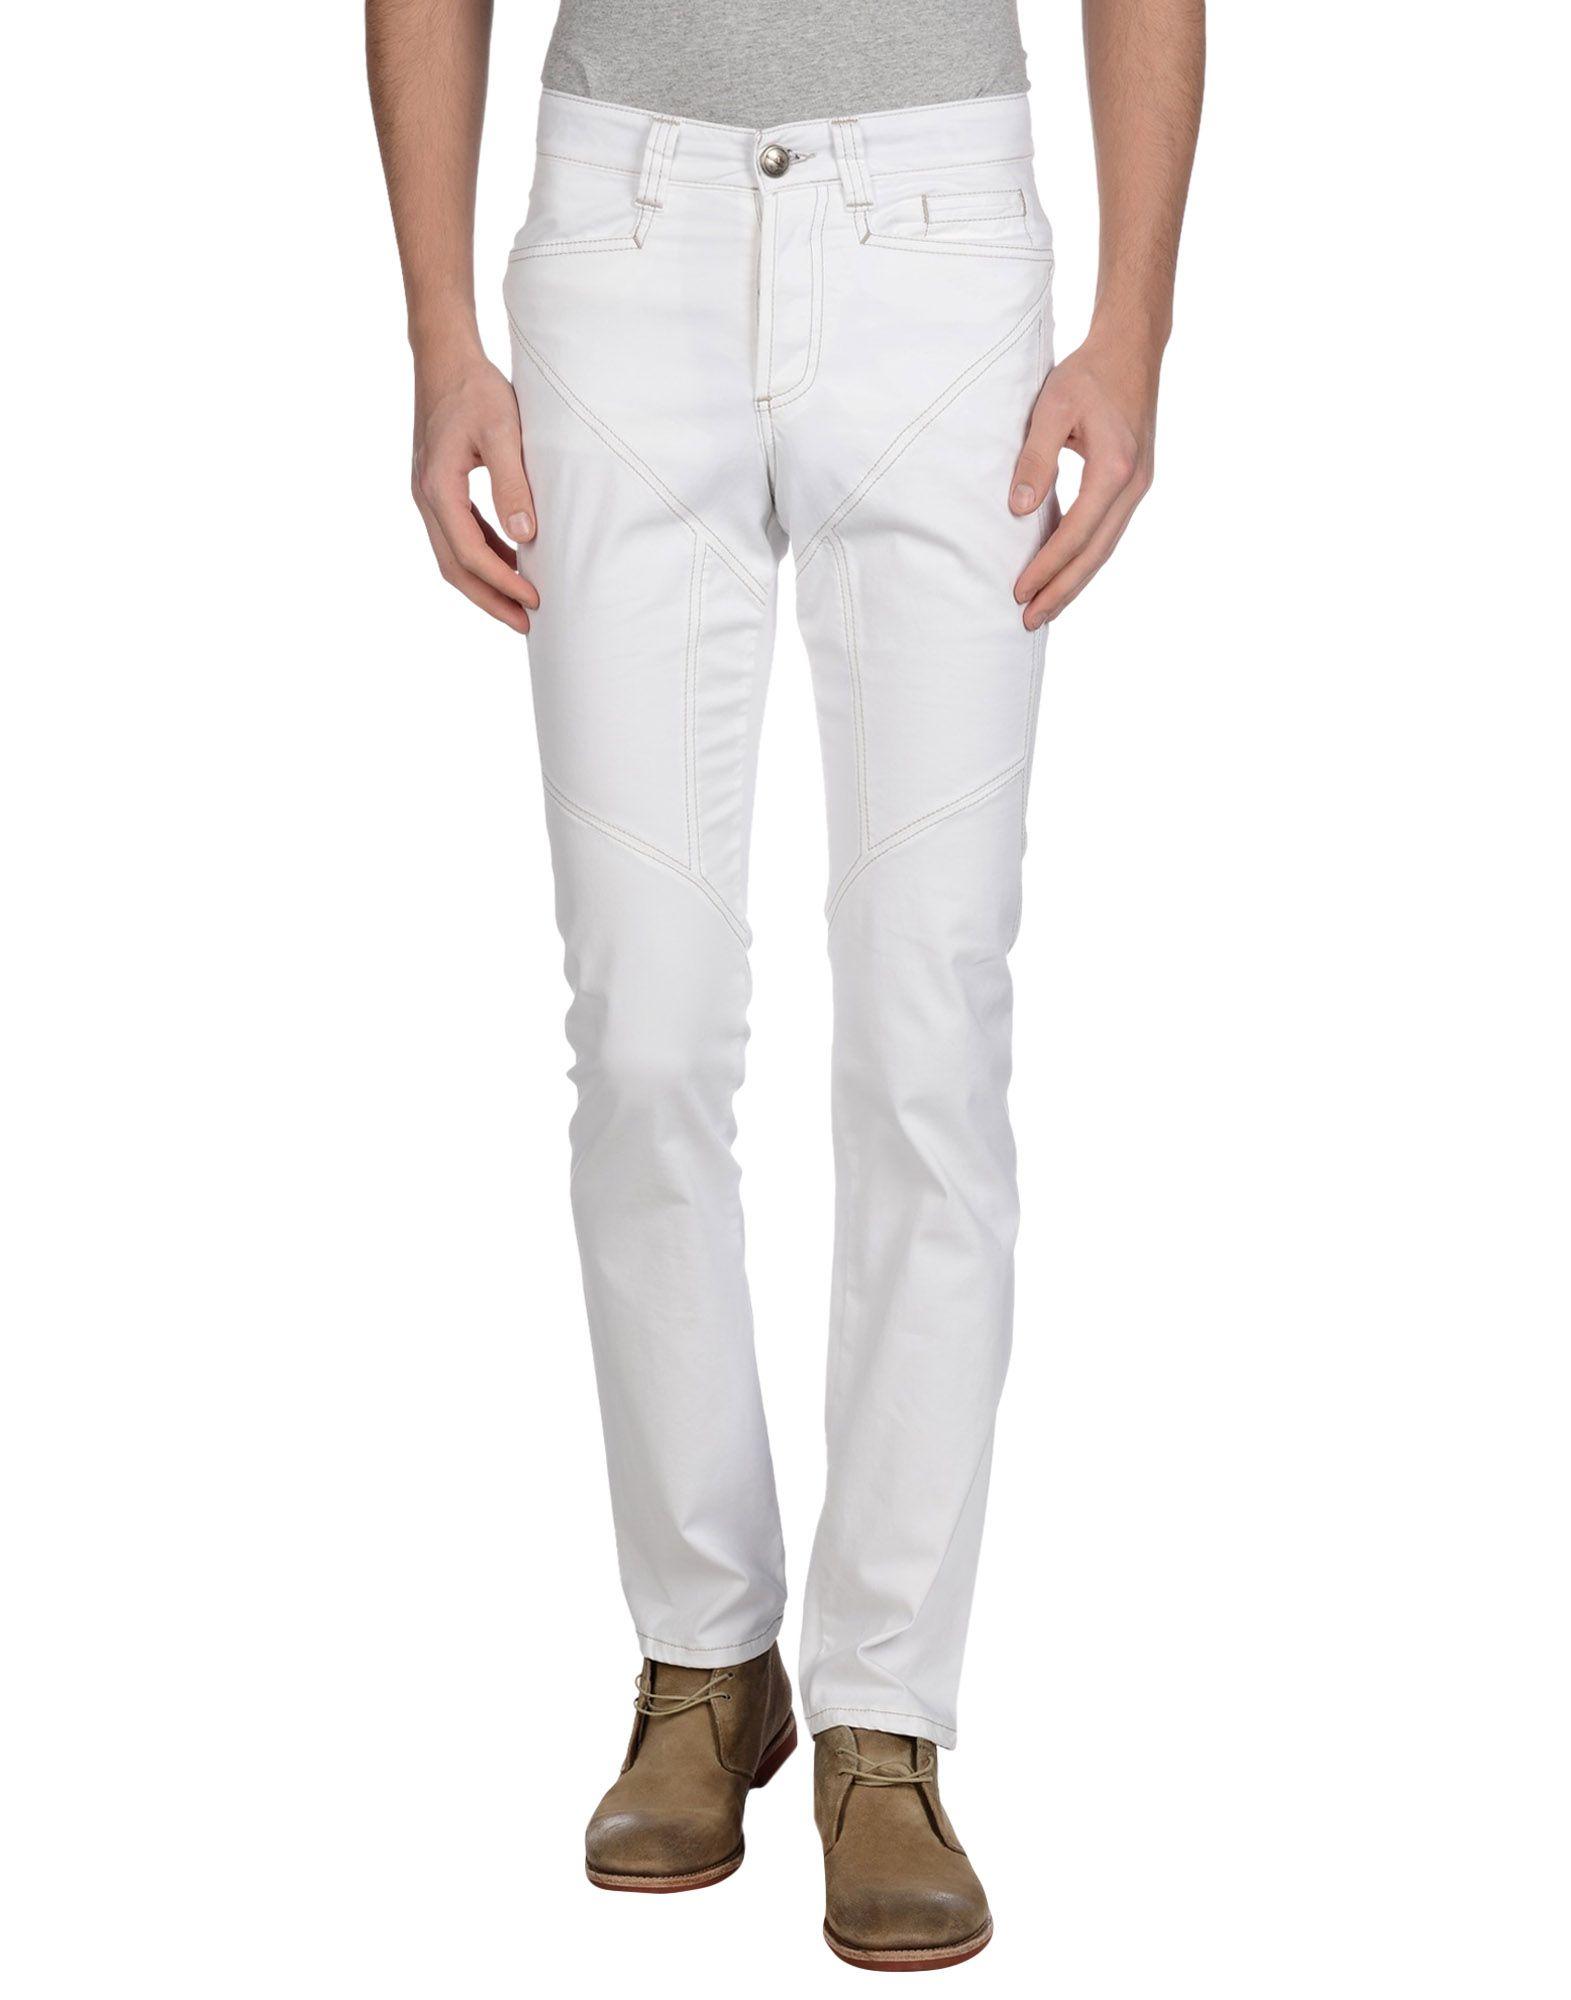 Pantalone Pantalone 9.2 By Carlo  onna uomo - 36769714FJ  neuer Stil